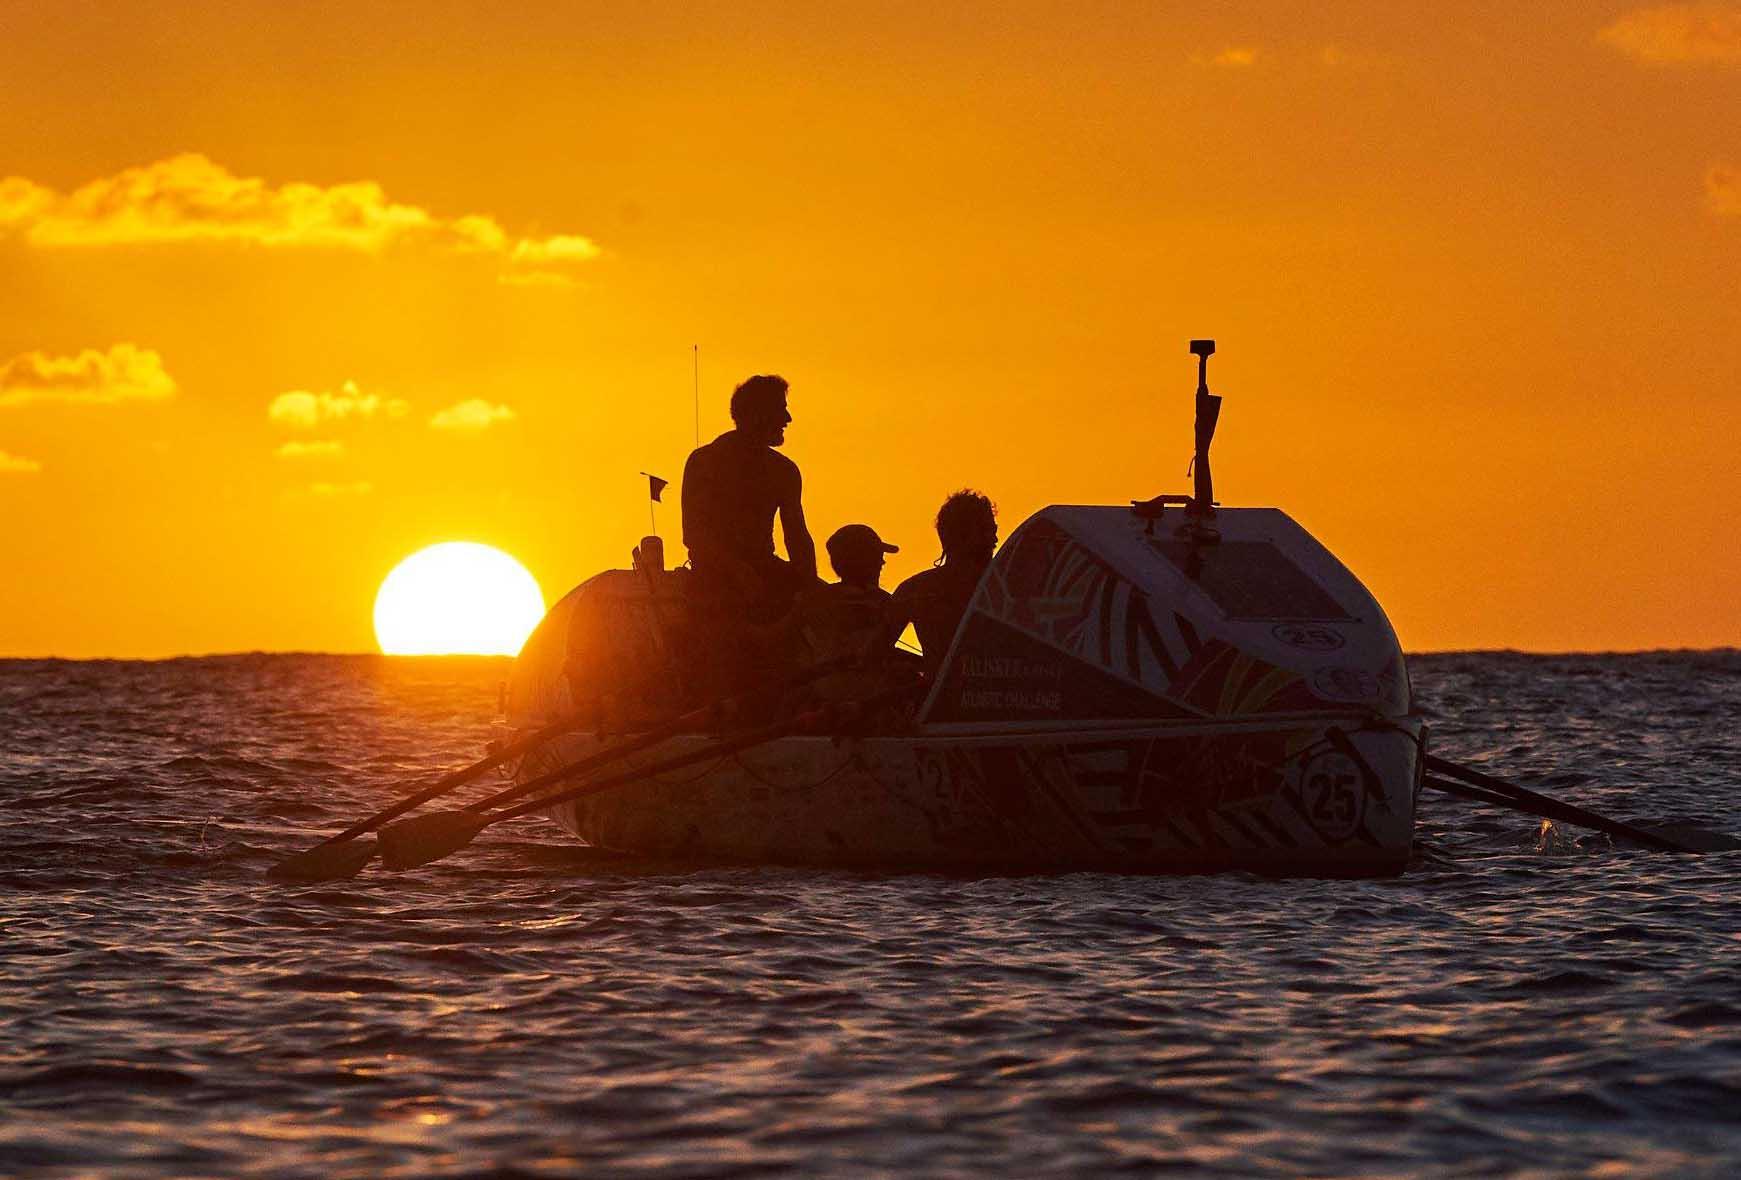 Mark Agnew Team Tyne Innovation, rowing the Atlantic in 201819s